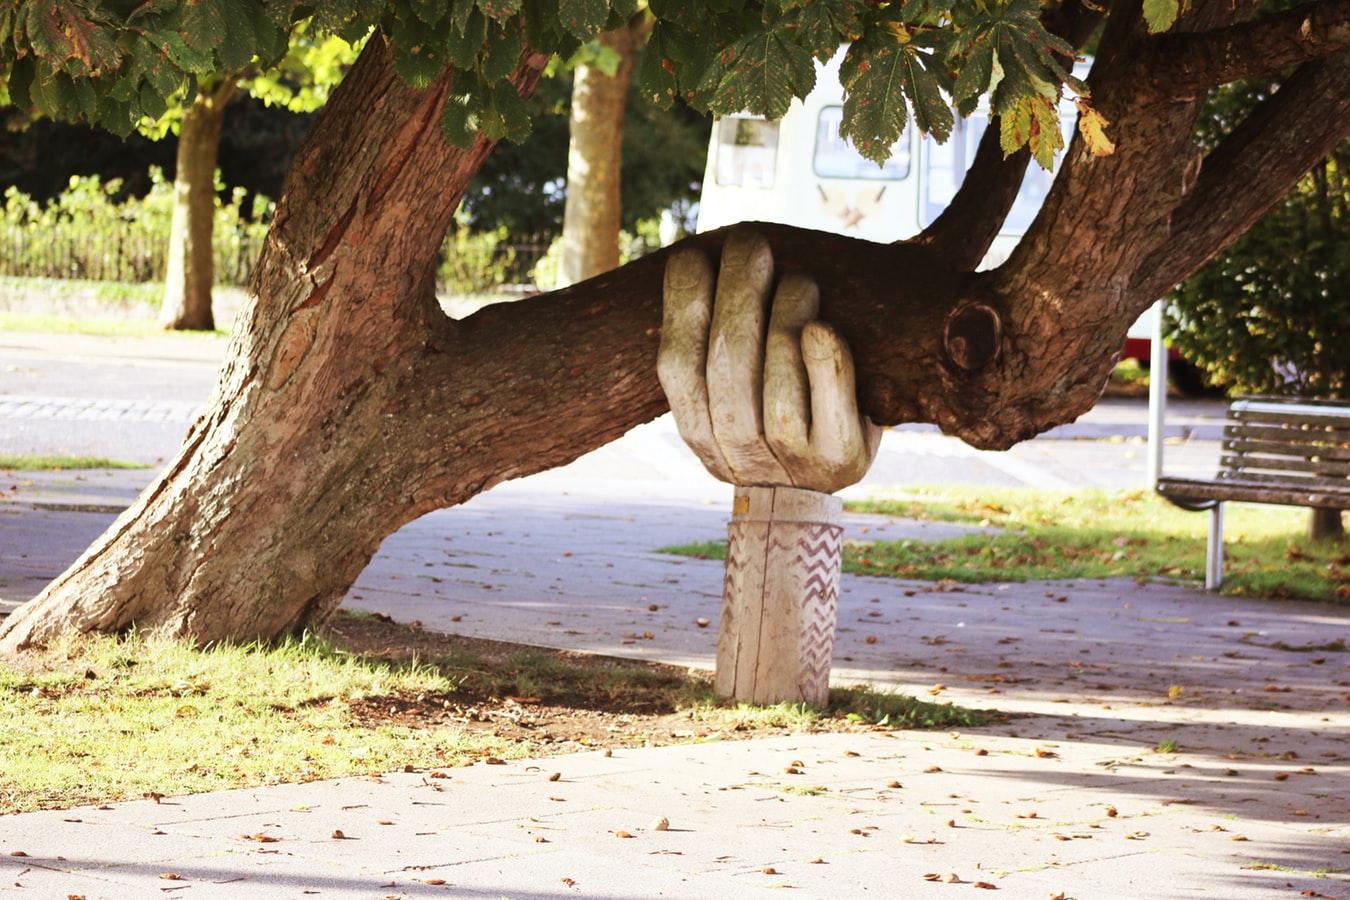 Pflegebedürftig, Hilfe, helfende Hand